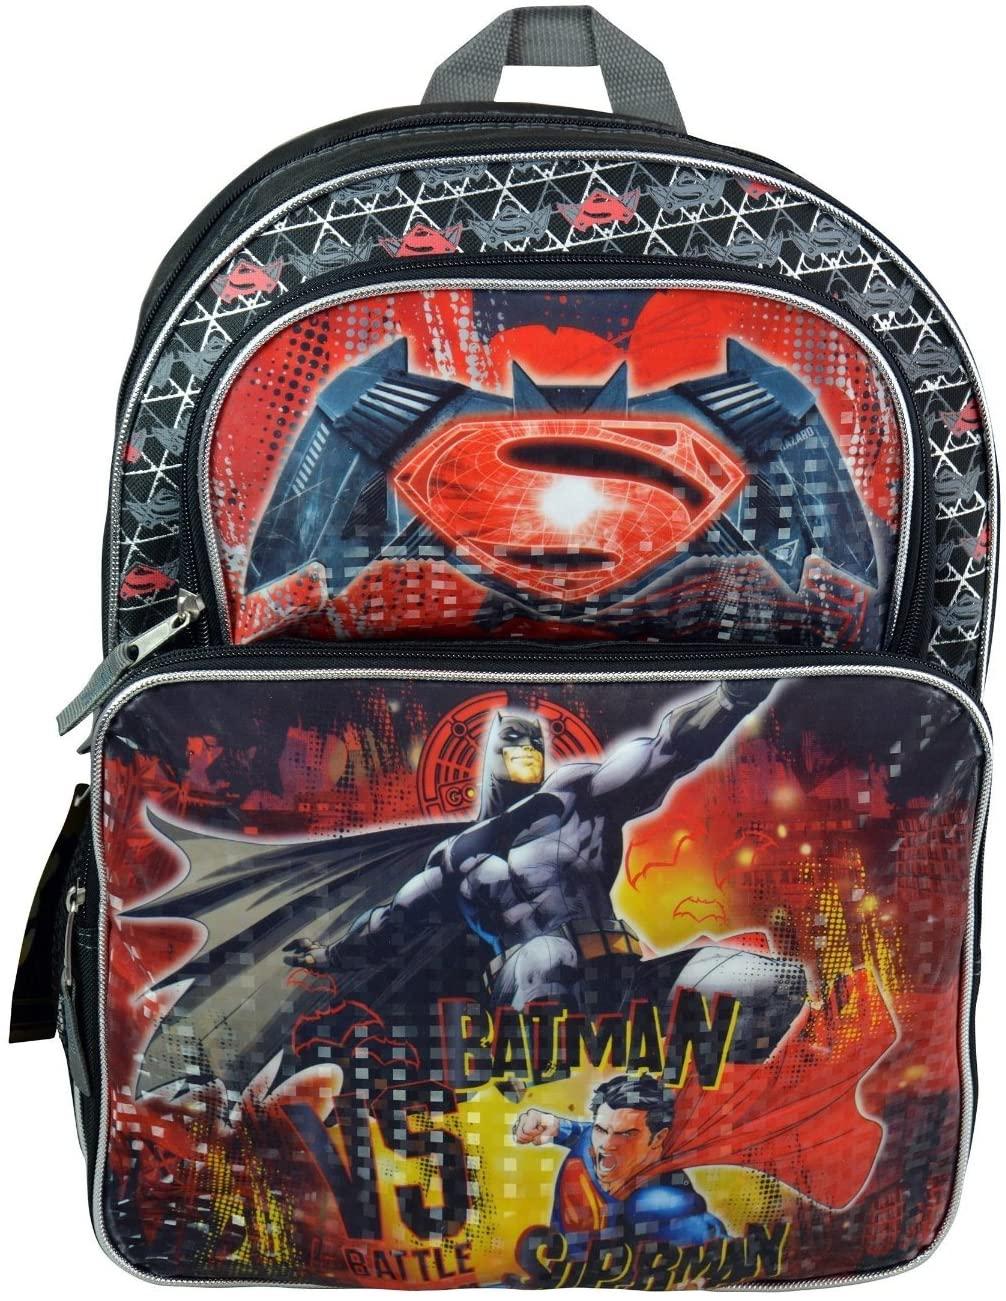 Batman CABTA v/s Superman Cargo Backpack, 16